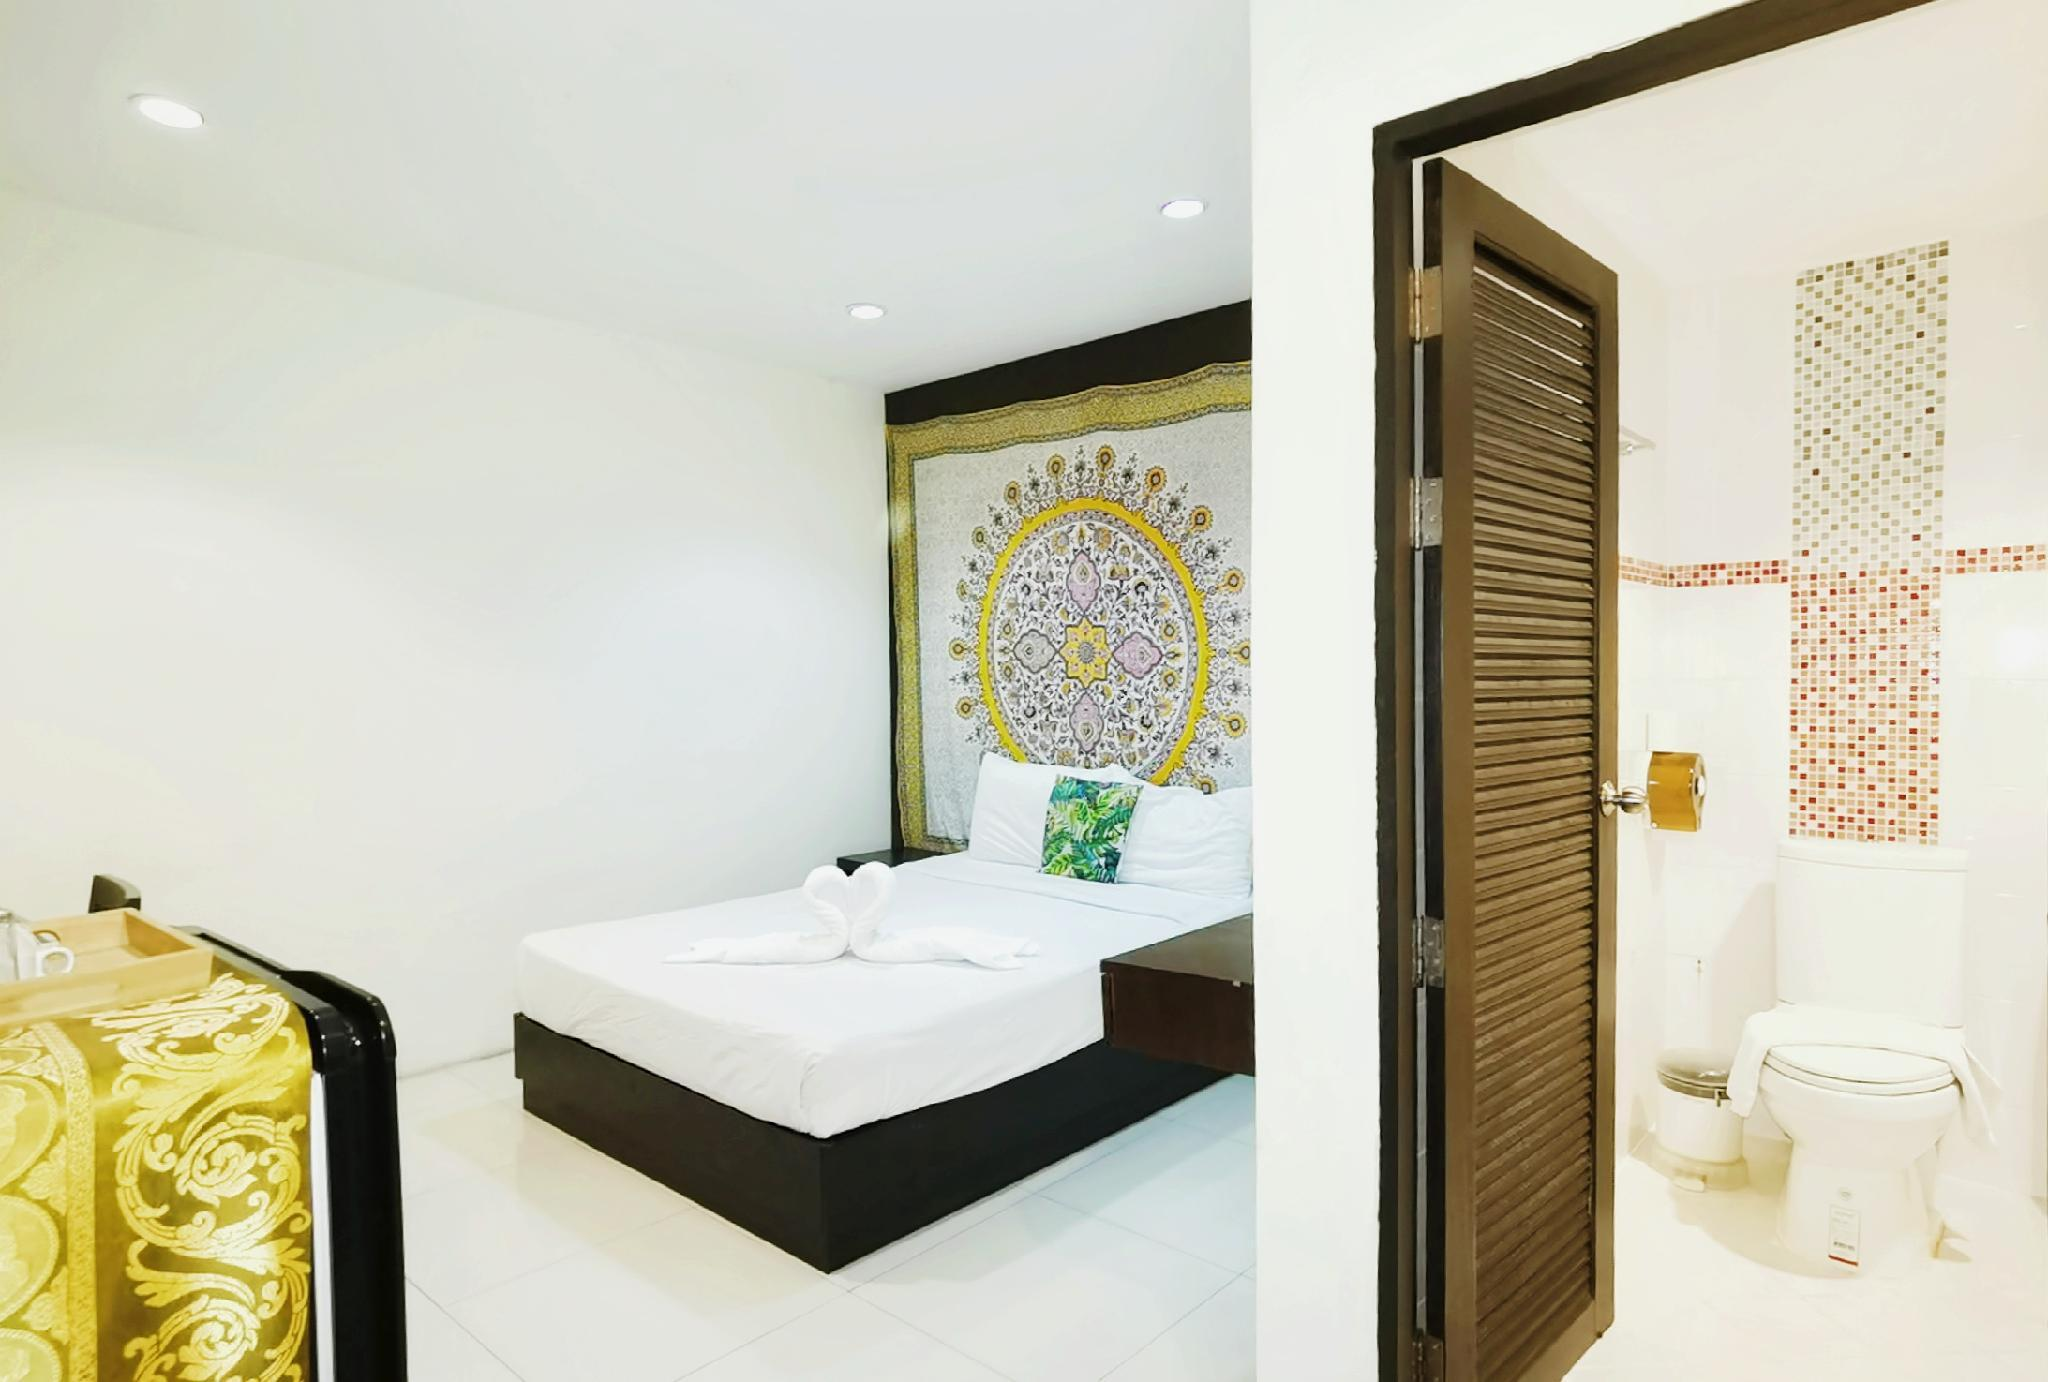 53Long Rent Patong Economy Room#Near Beach Bangla อพาร์ตเมนต์ 1 ห้องนอน 1 ห้องน้ำส่วนตัว ขนาด 30 ตร.ม. – ป่าตอง